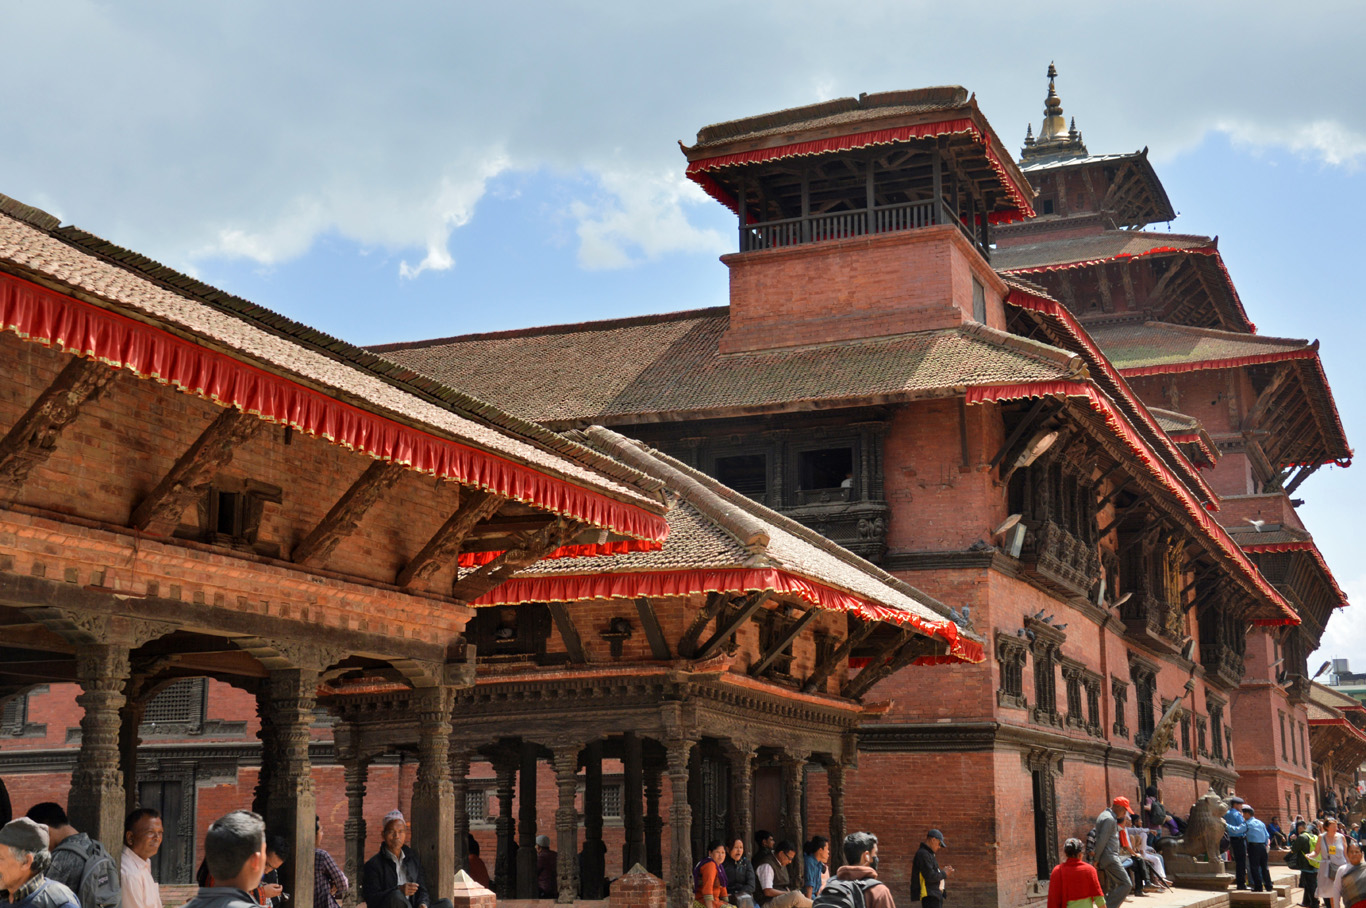 Beautiful Newa architecture at Patan Durbar Square